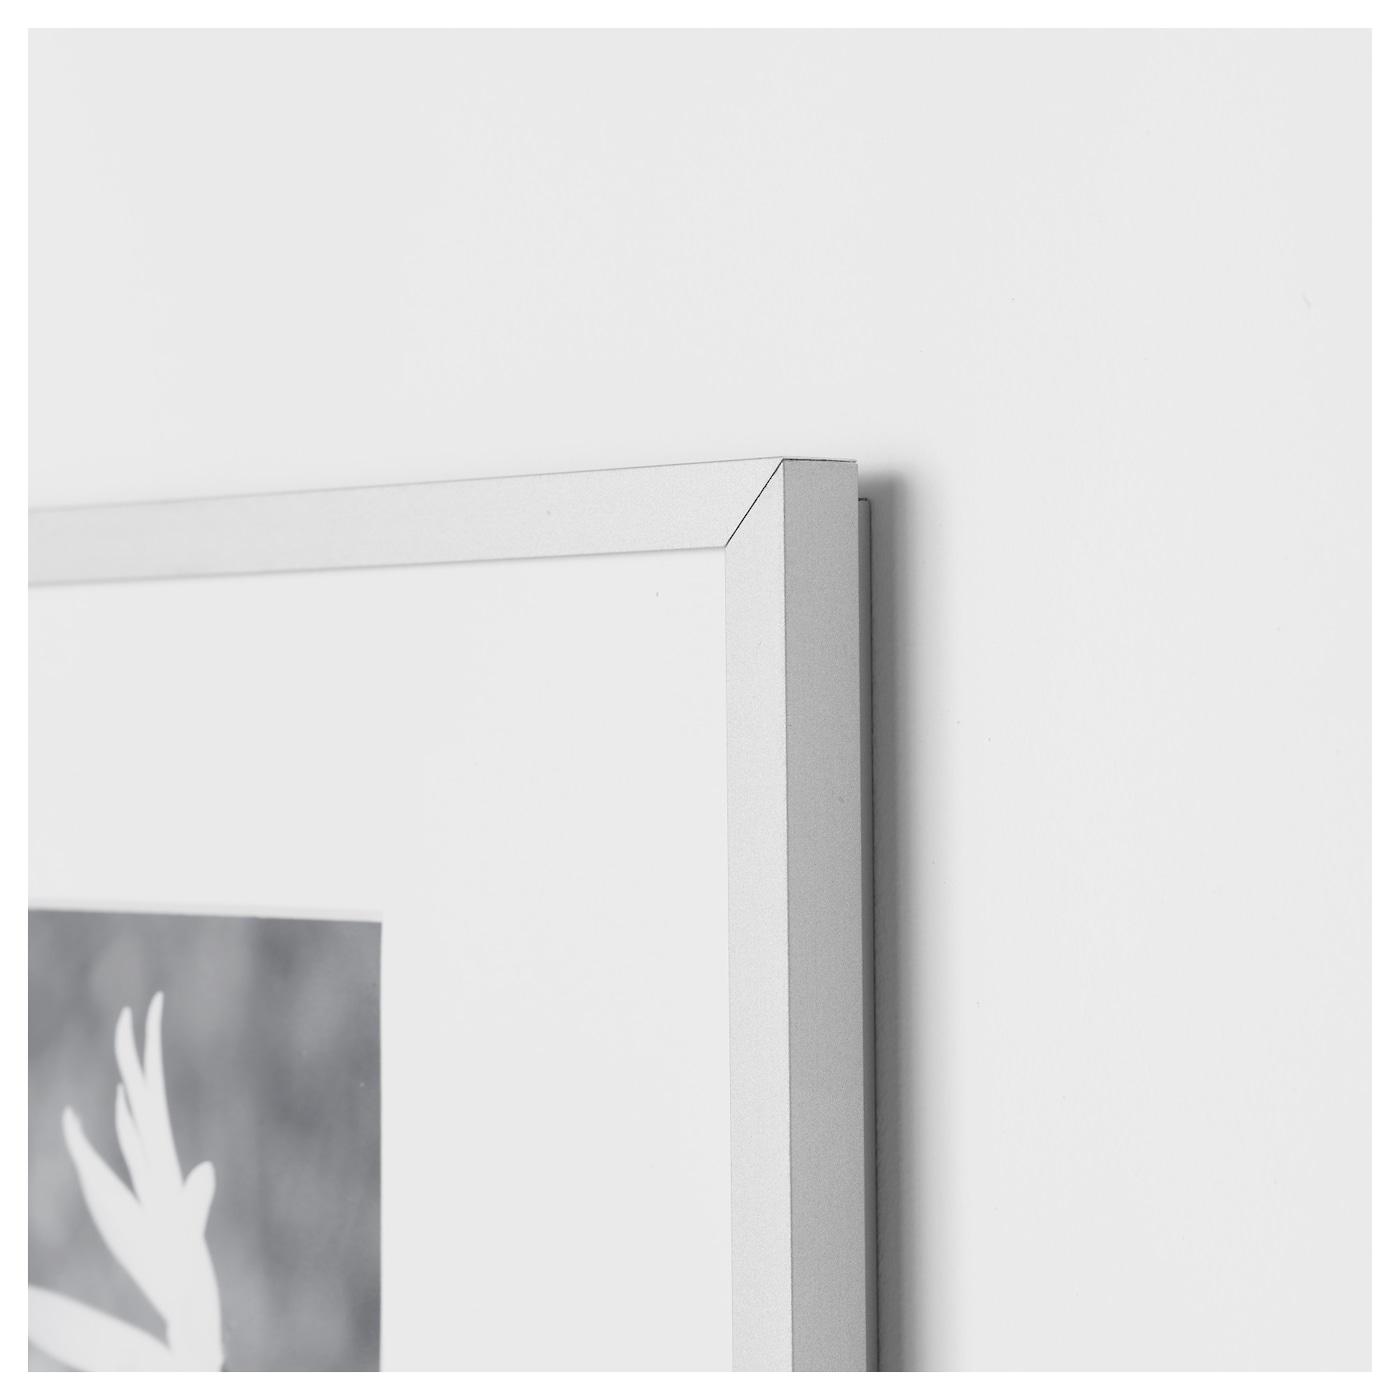 LOMVIKEN Marco Aluminio 32 x 32 cm - IKEA